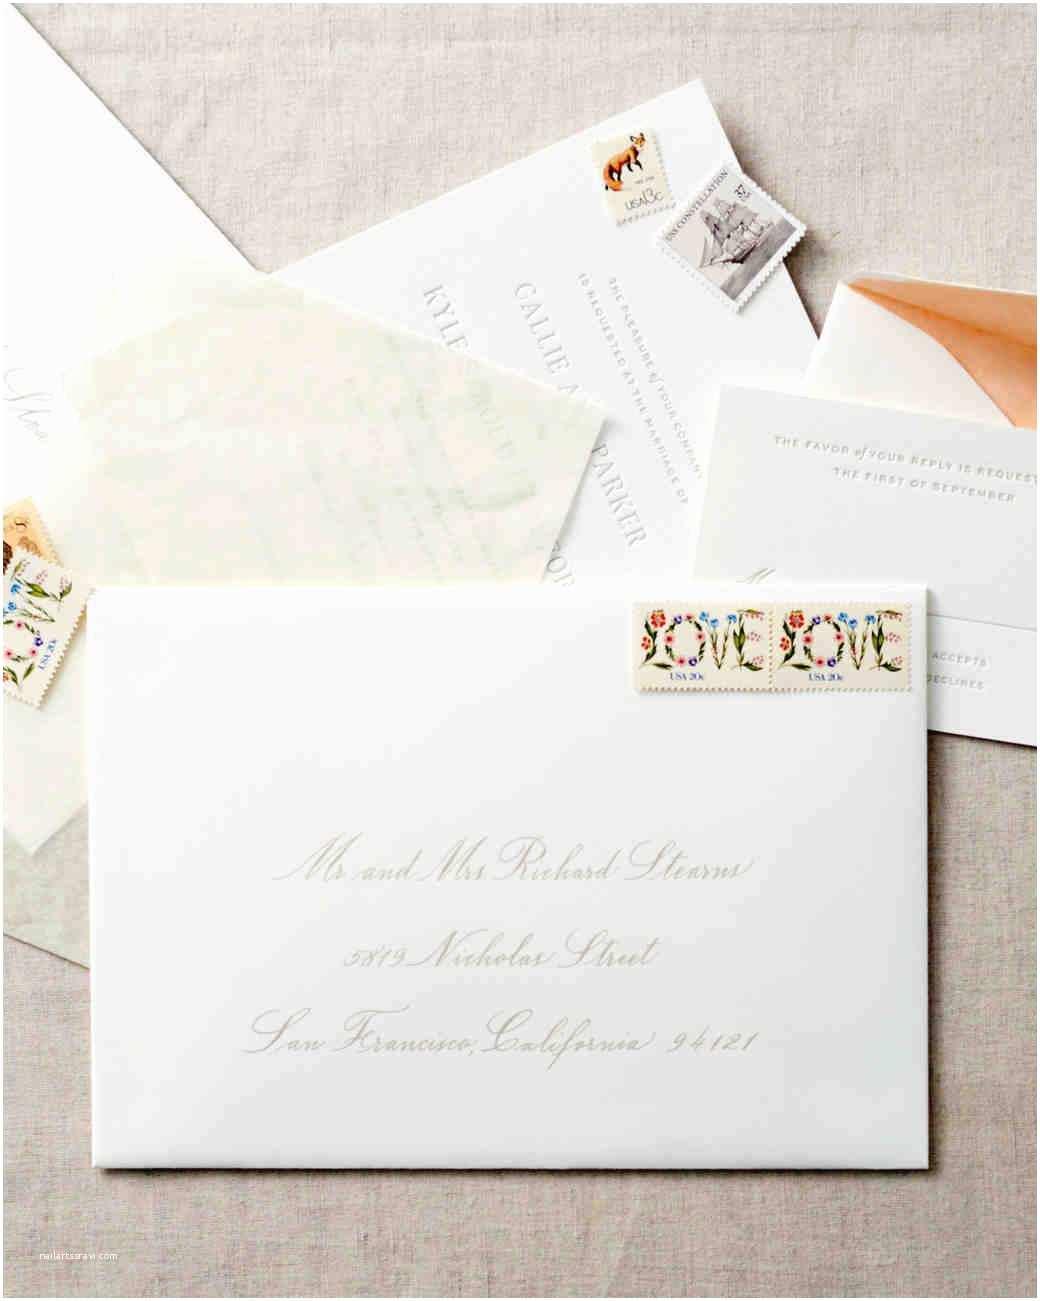 Wedding Invitation No Plus One Wedding Invitation Etiquette Guest Plus E Yaseen for